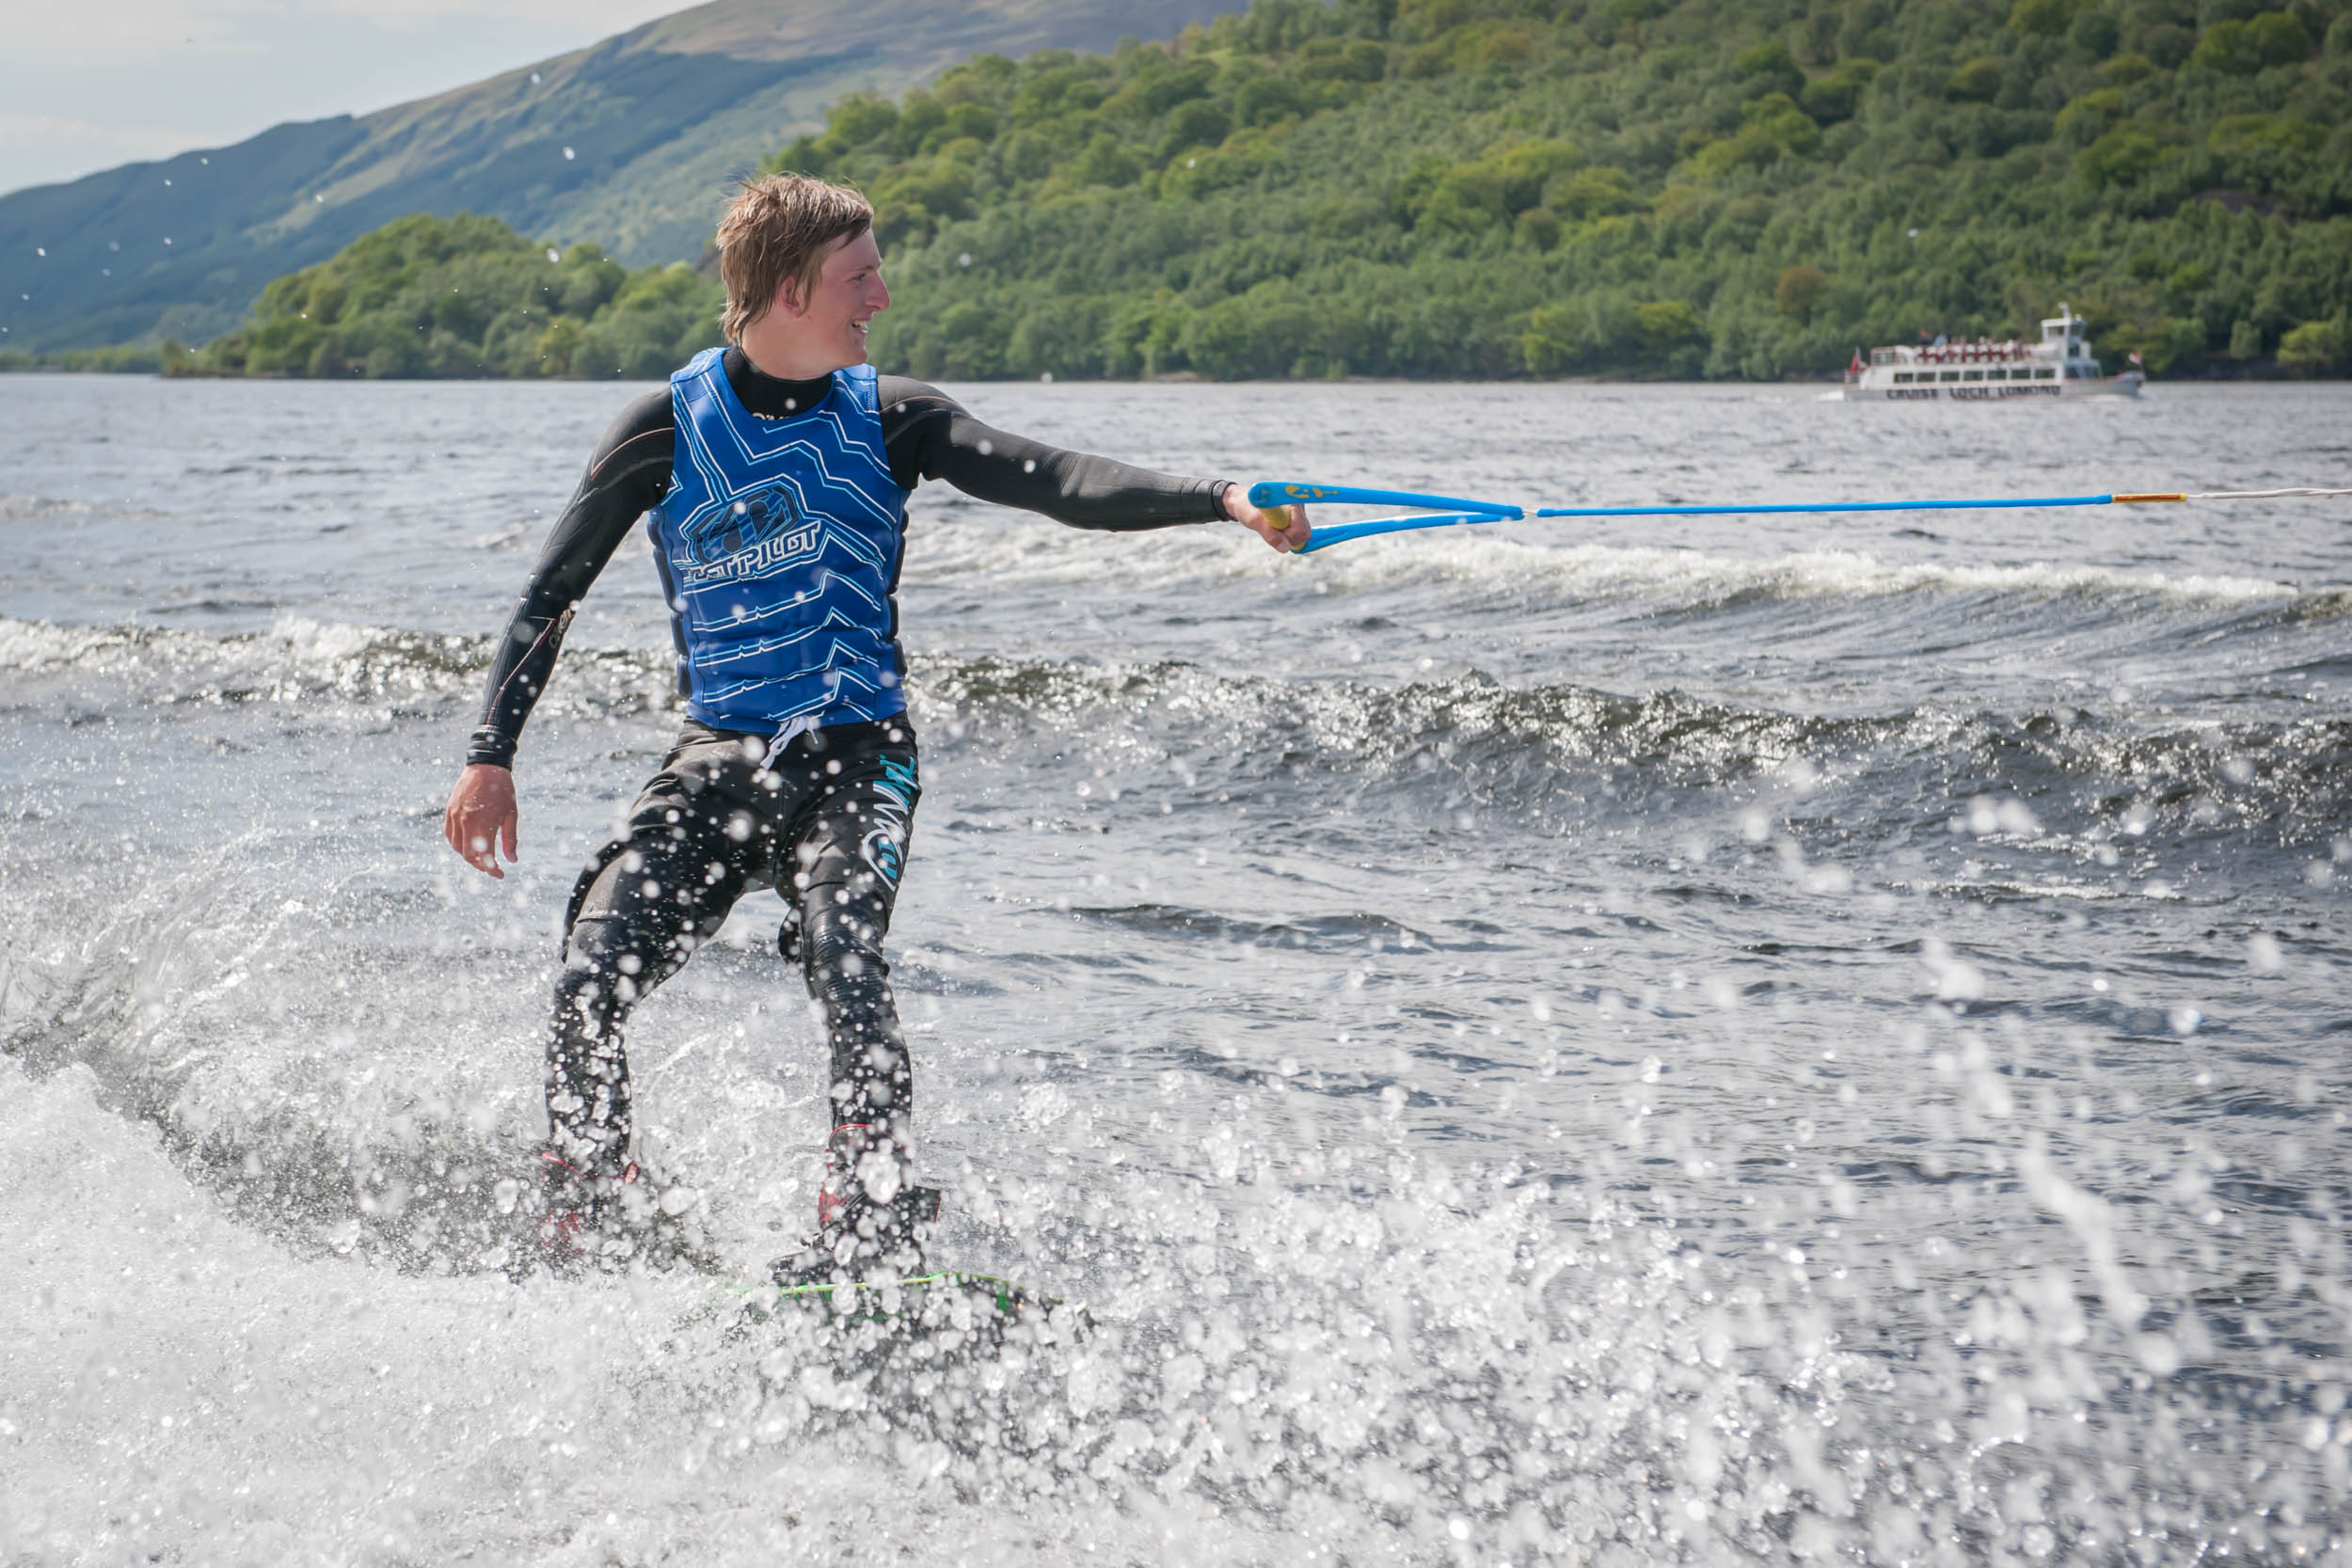 Loch Lomond Wakeboard, Ardlui